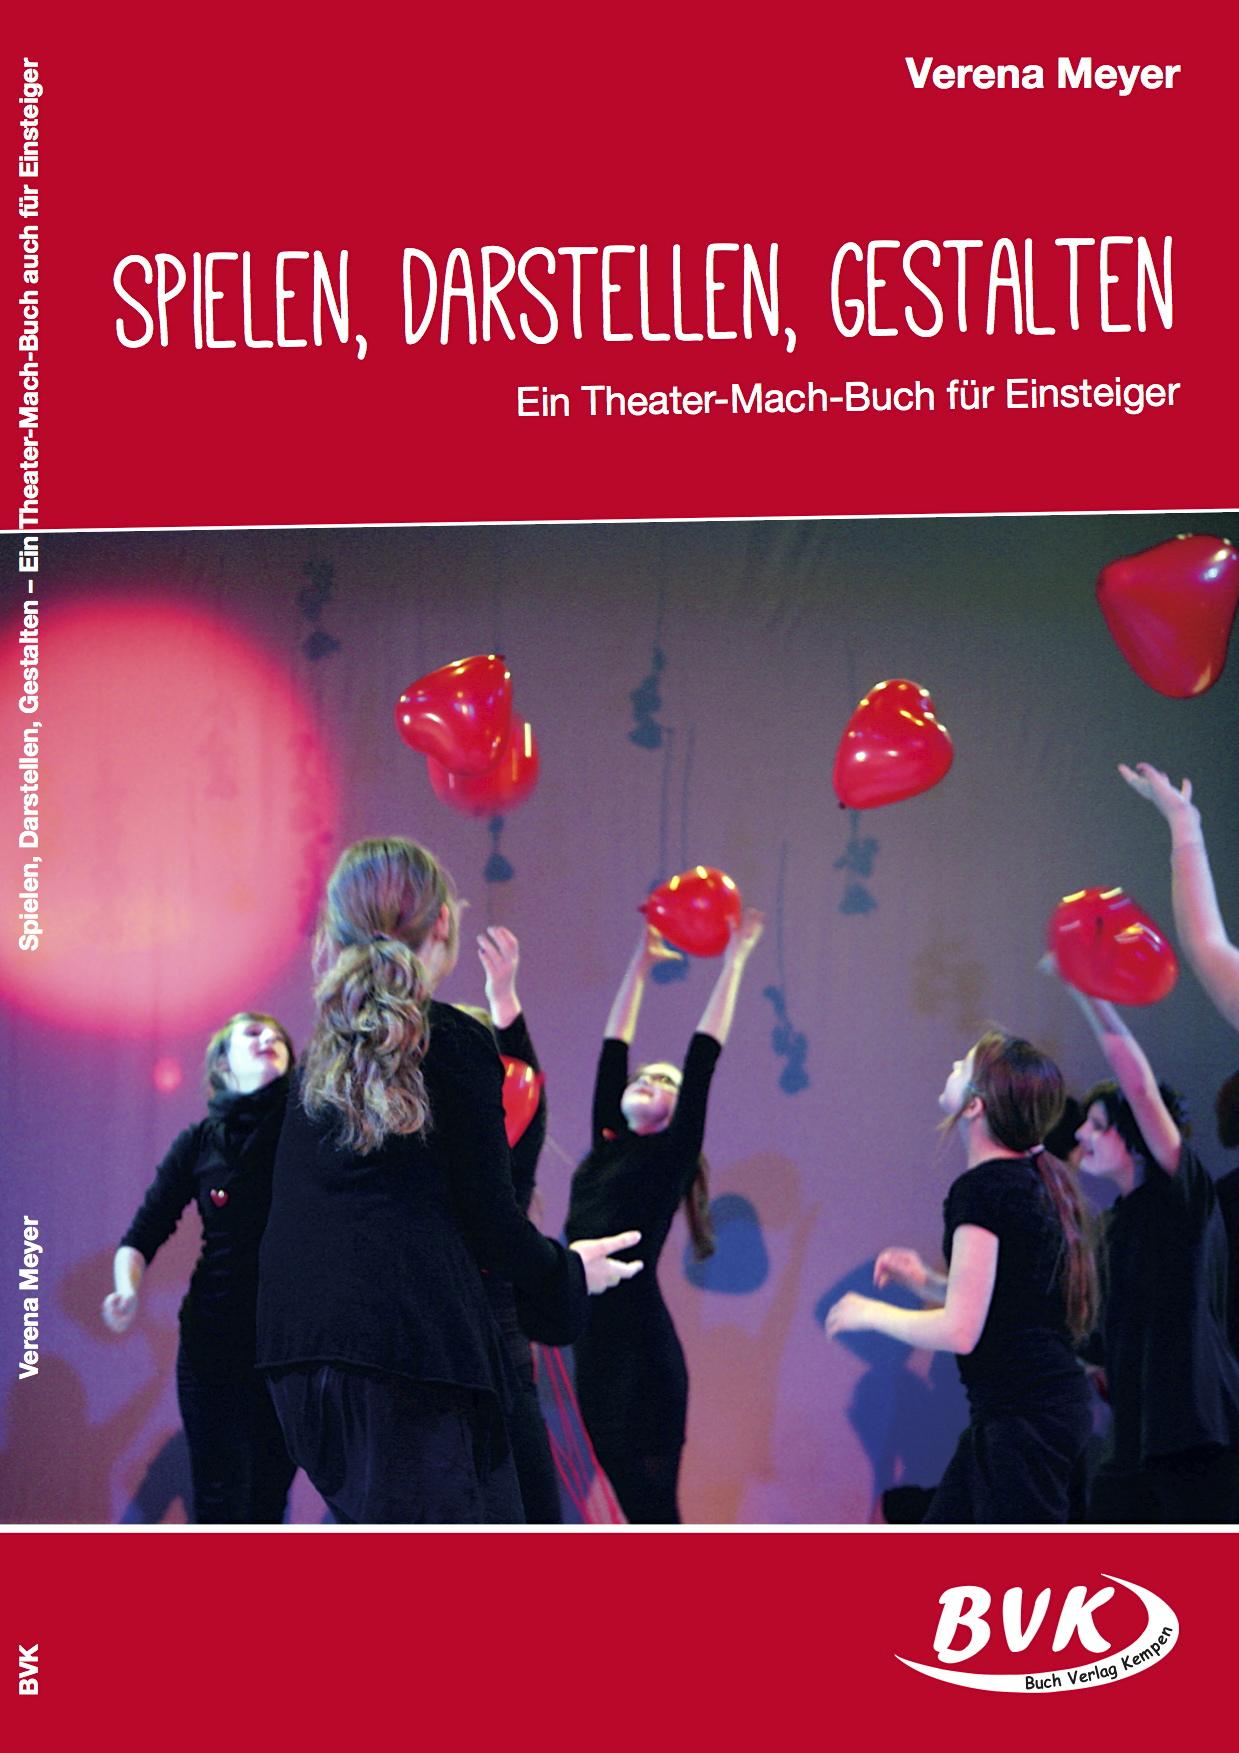 Verena Meyer | Autorenwelt